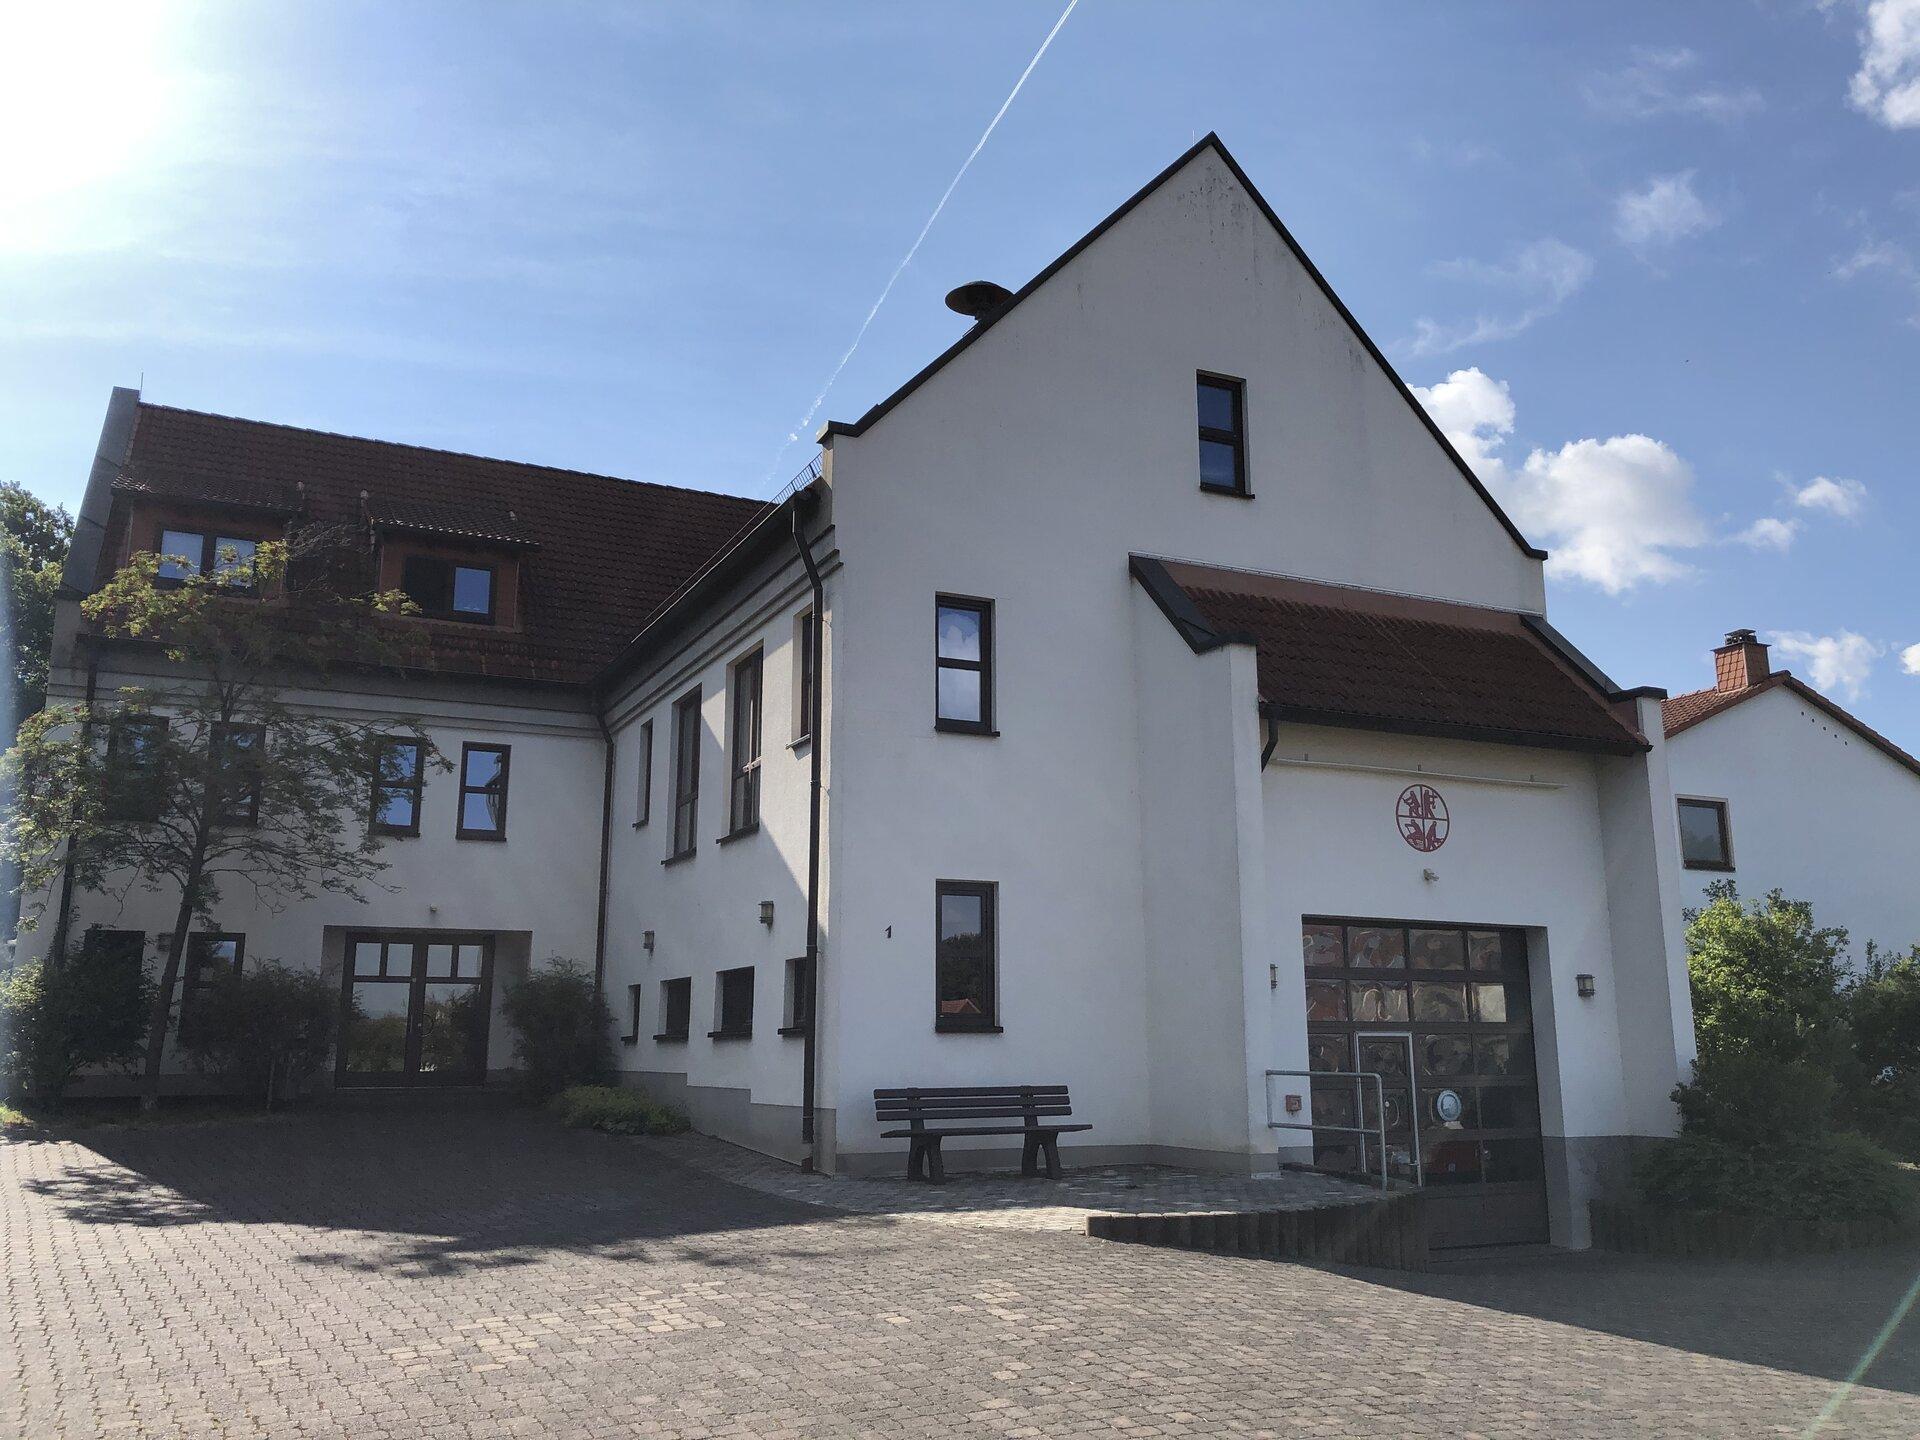 DGH Mengshausen